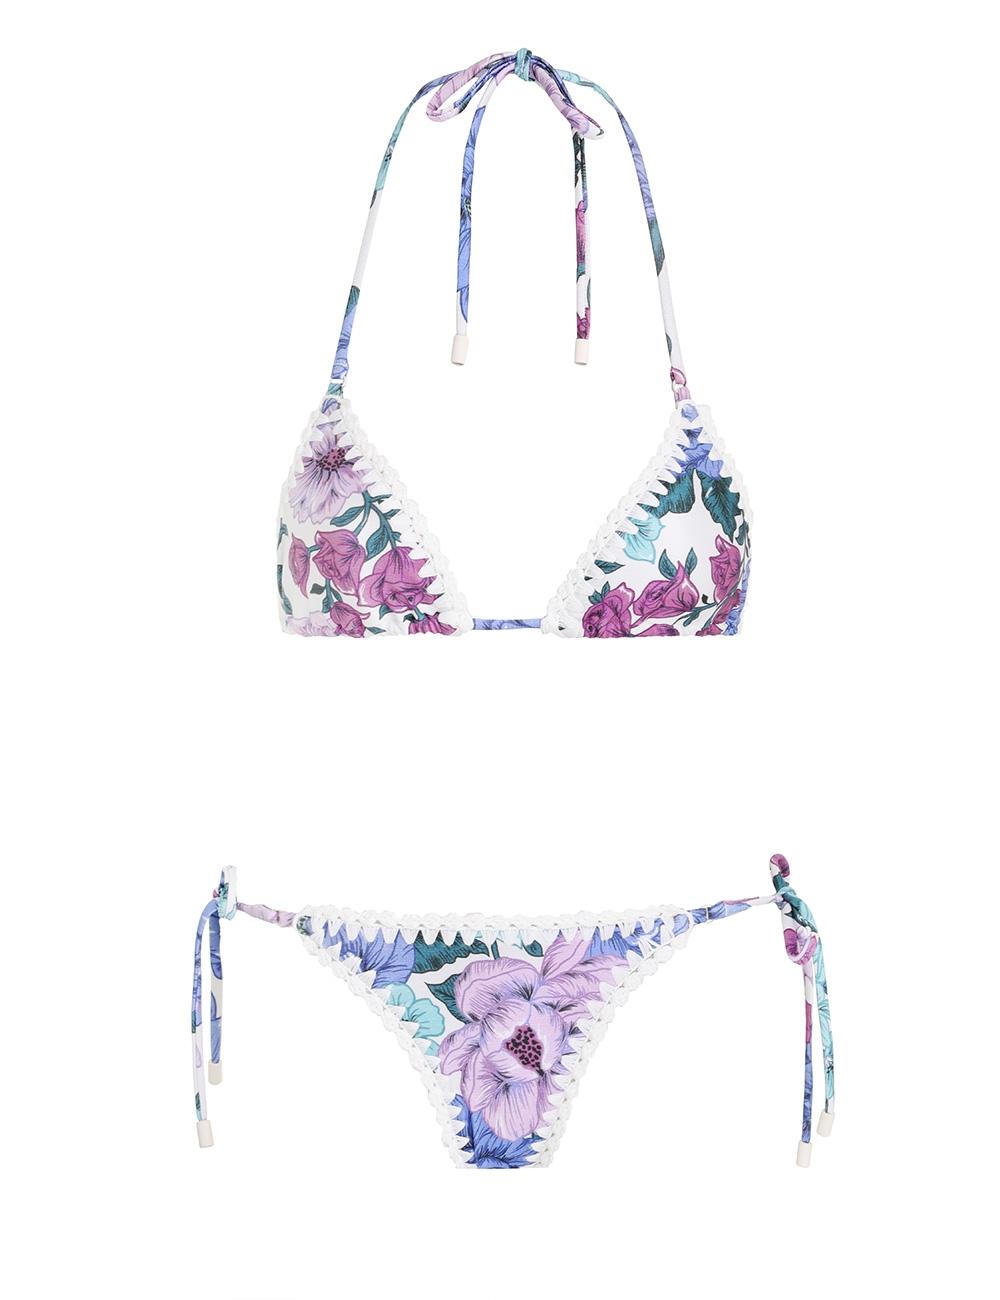 Poppy Crochet Edge Bikini